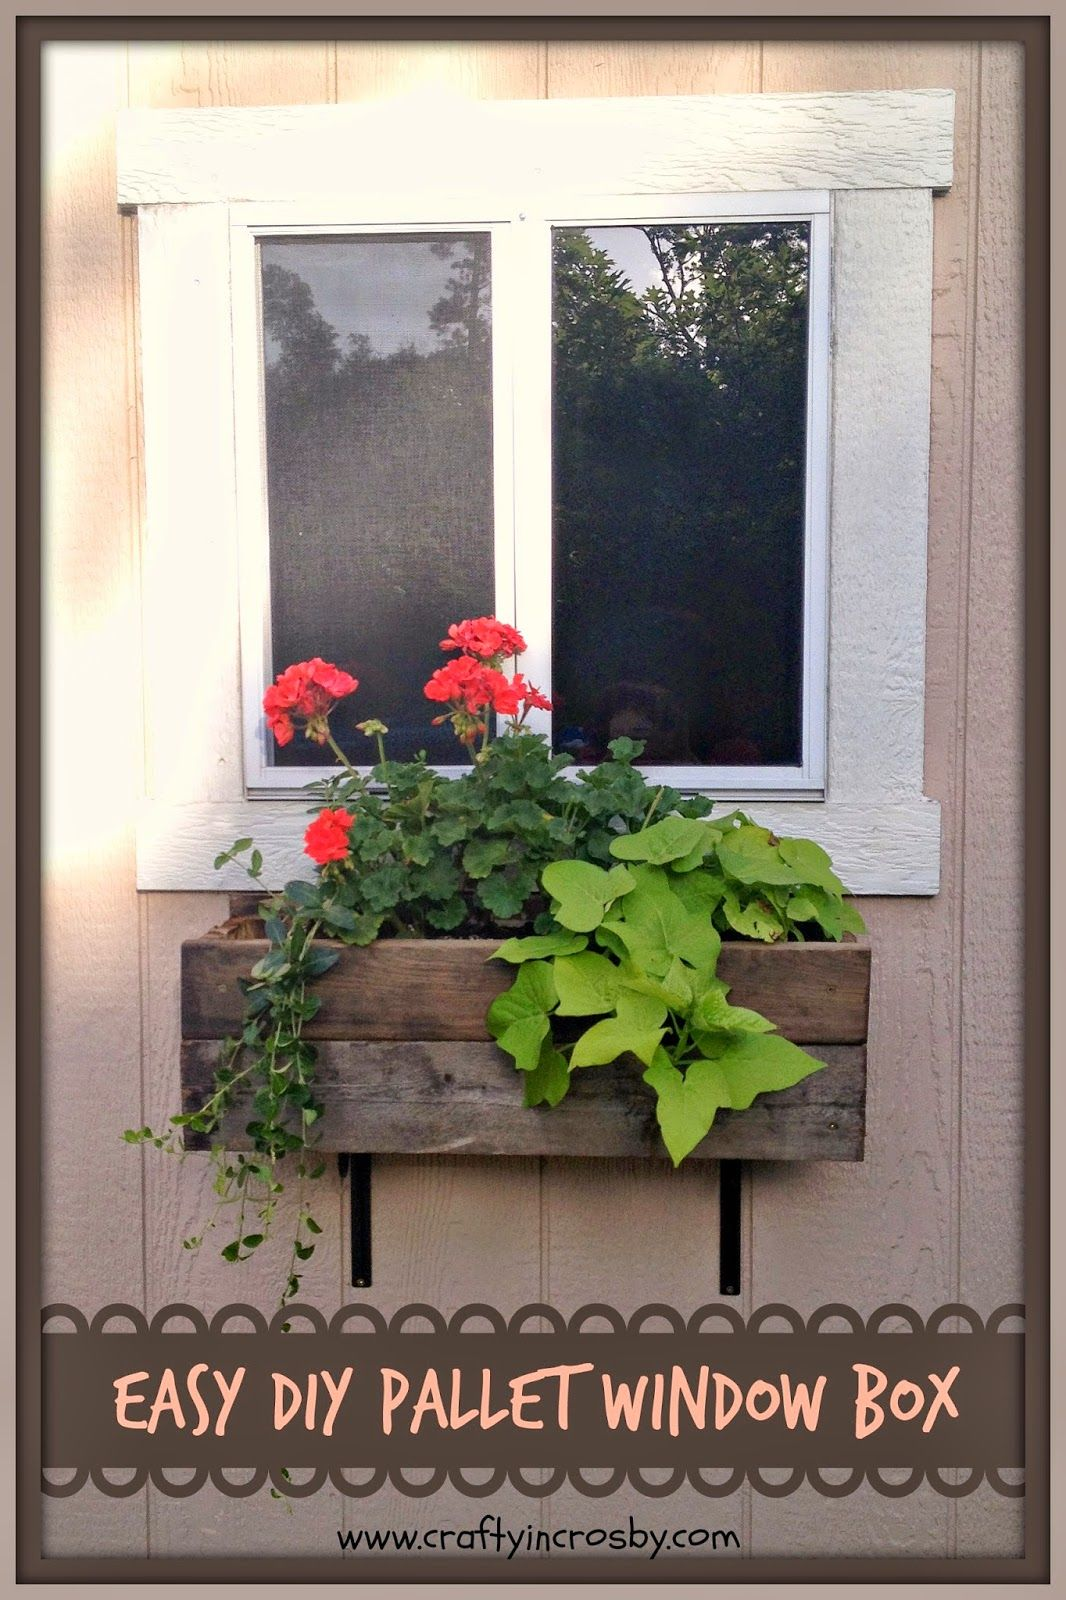 Easy DIY Pallet Window Box Diy flower boxes, Window box